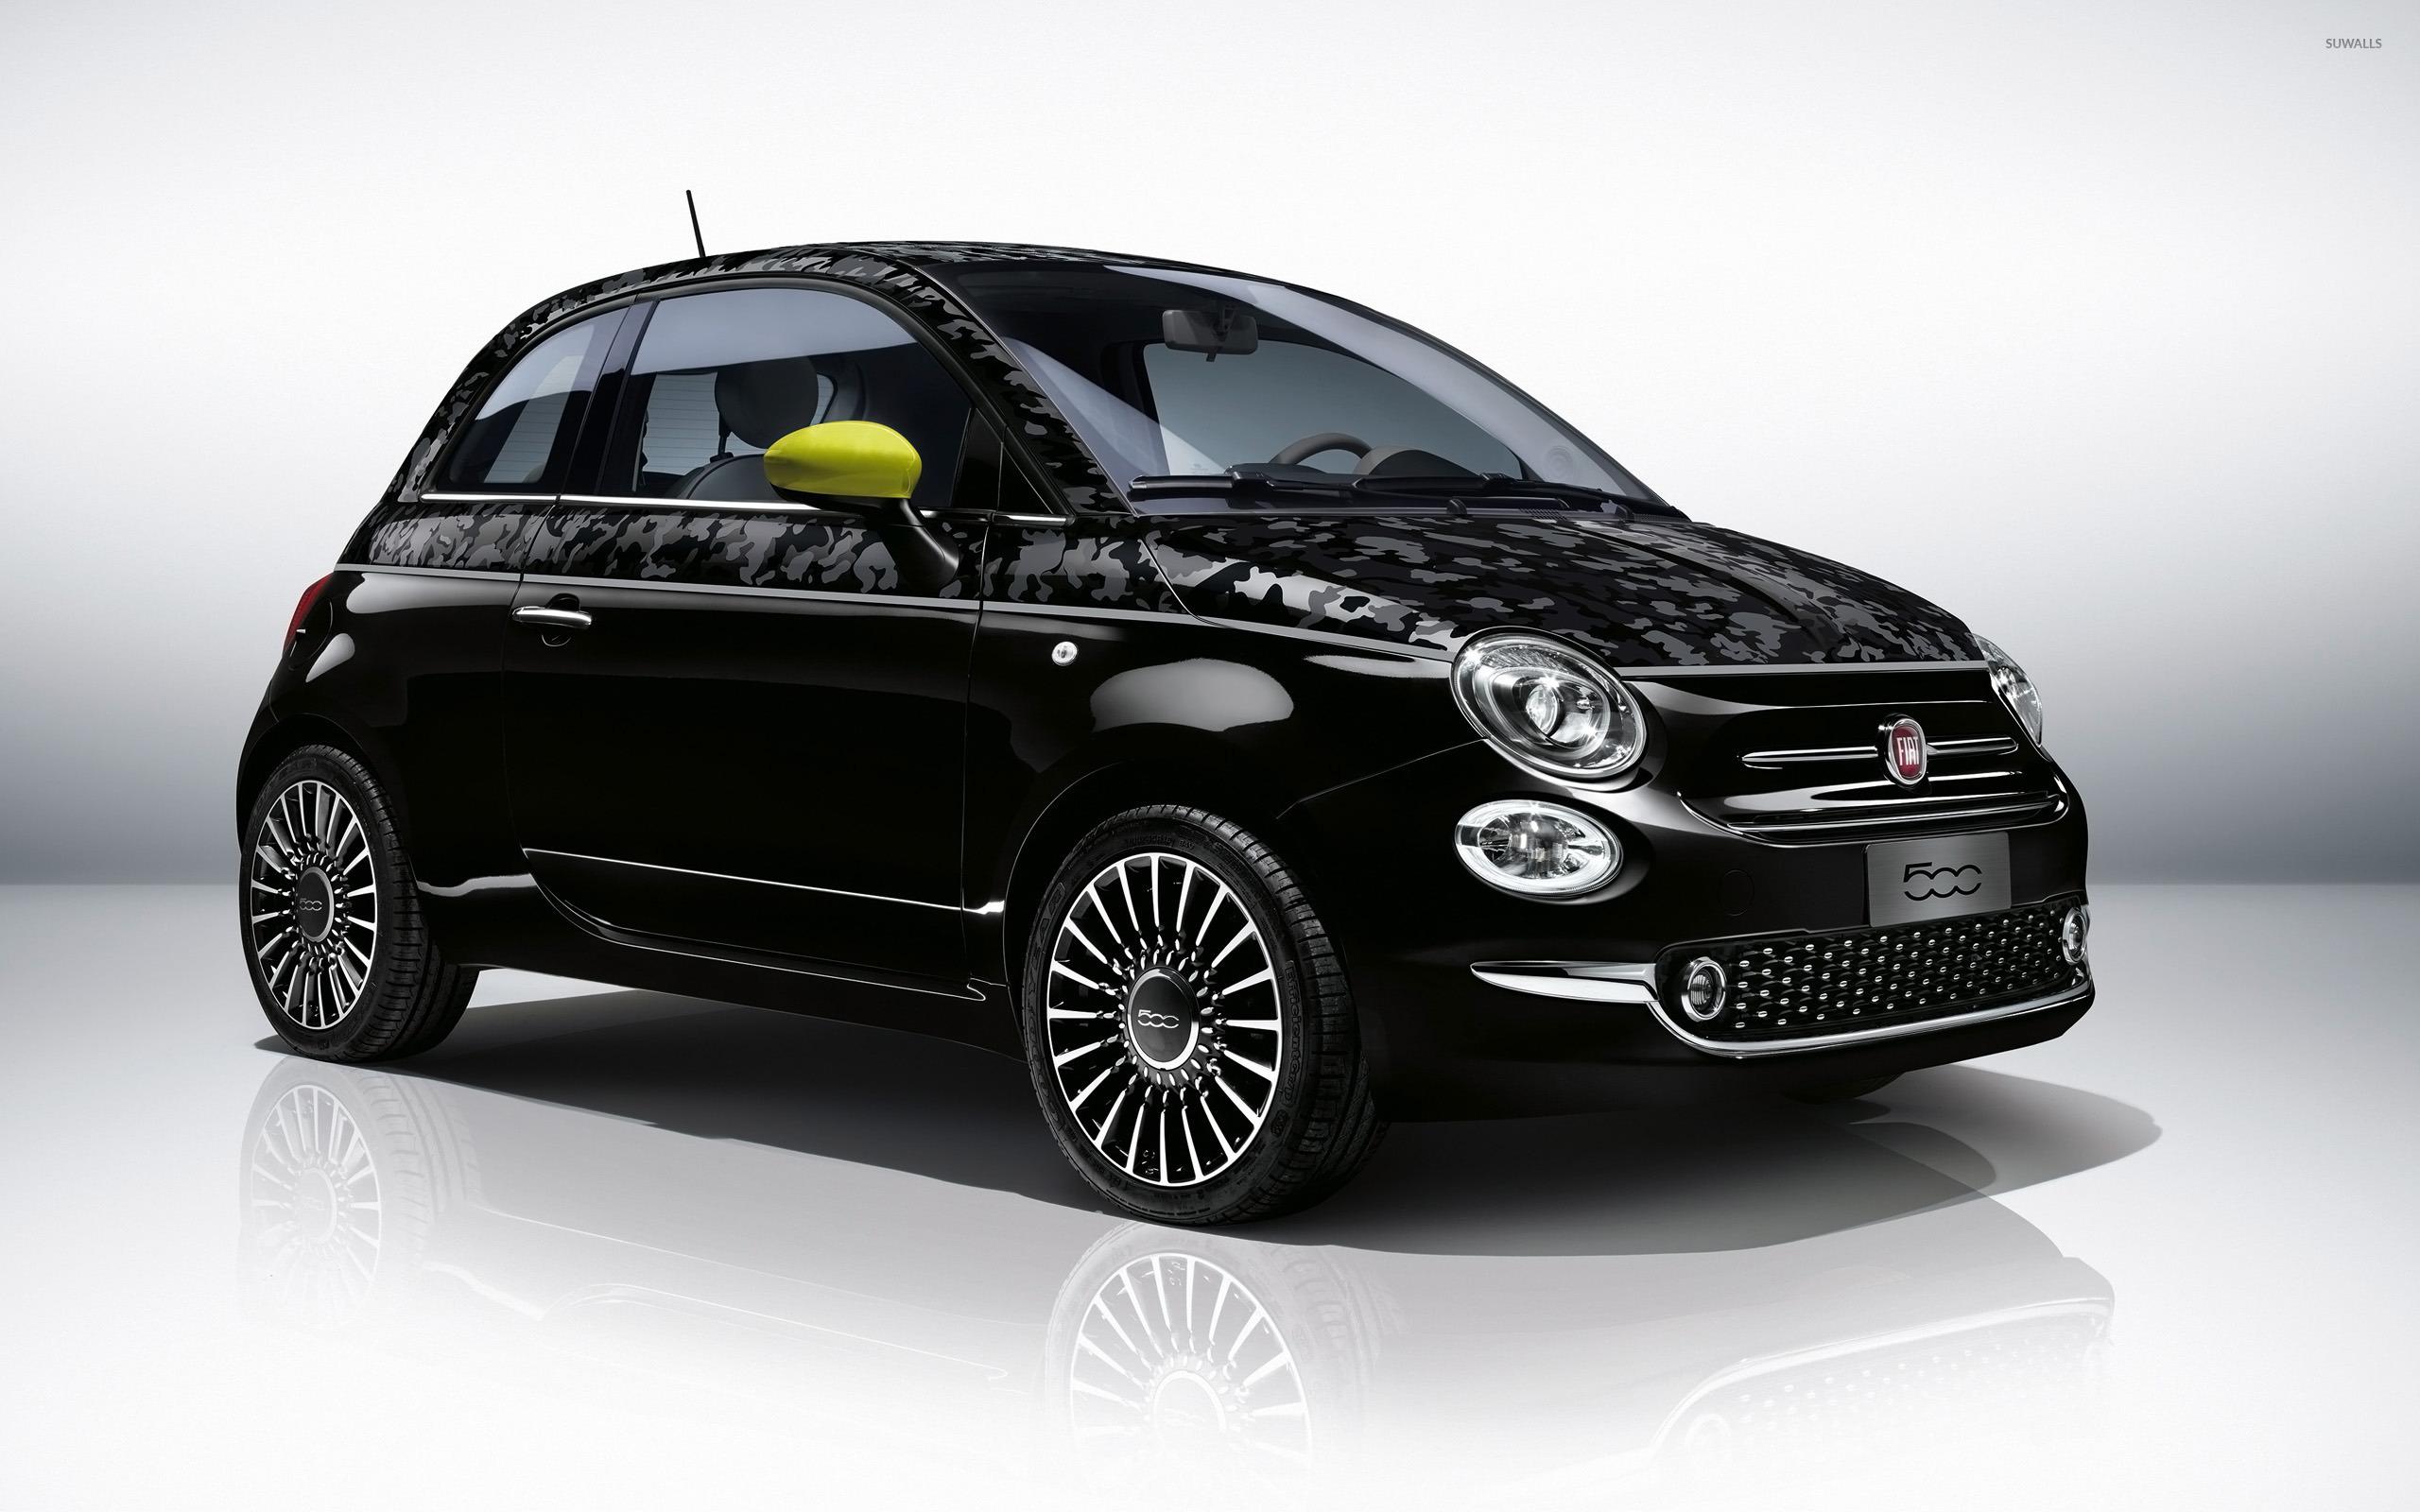 2016 black fiat 500 wallpaper car wallpapers 50218. Black Bedroom Furniture Sets. Home Design Ideas